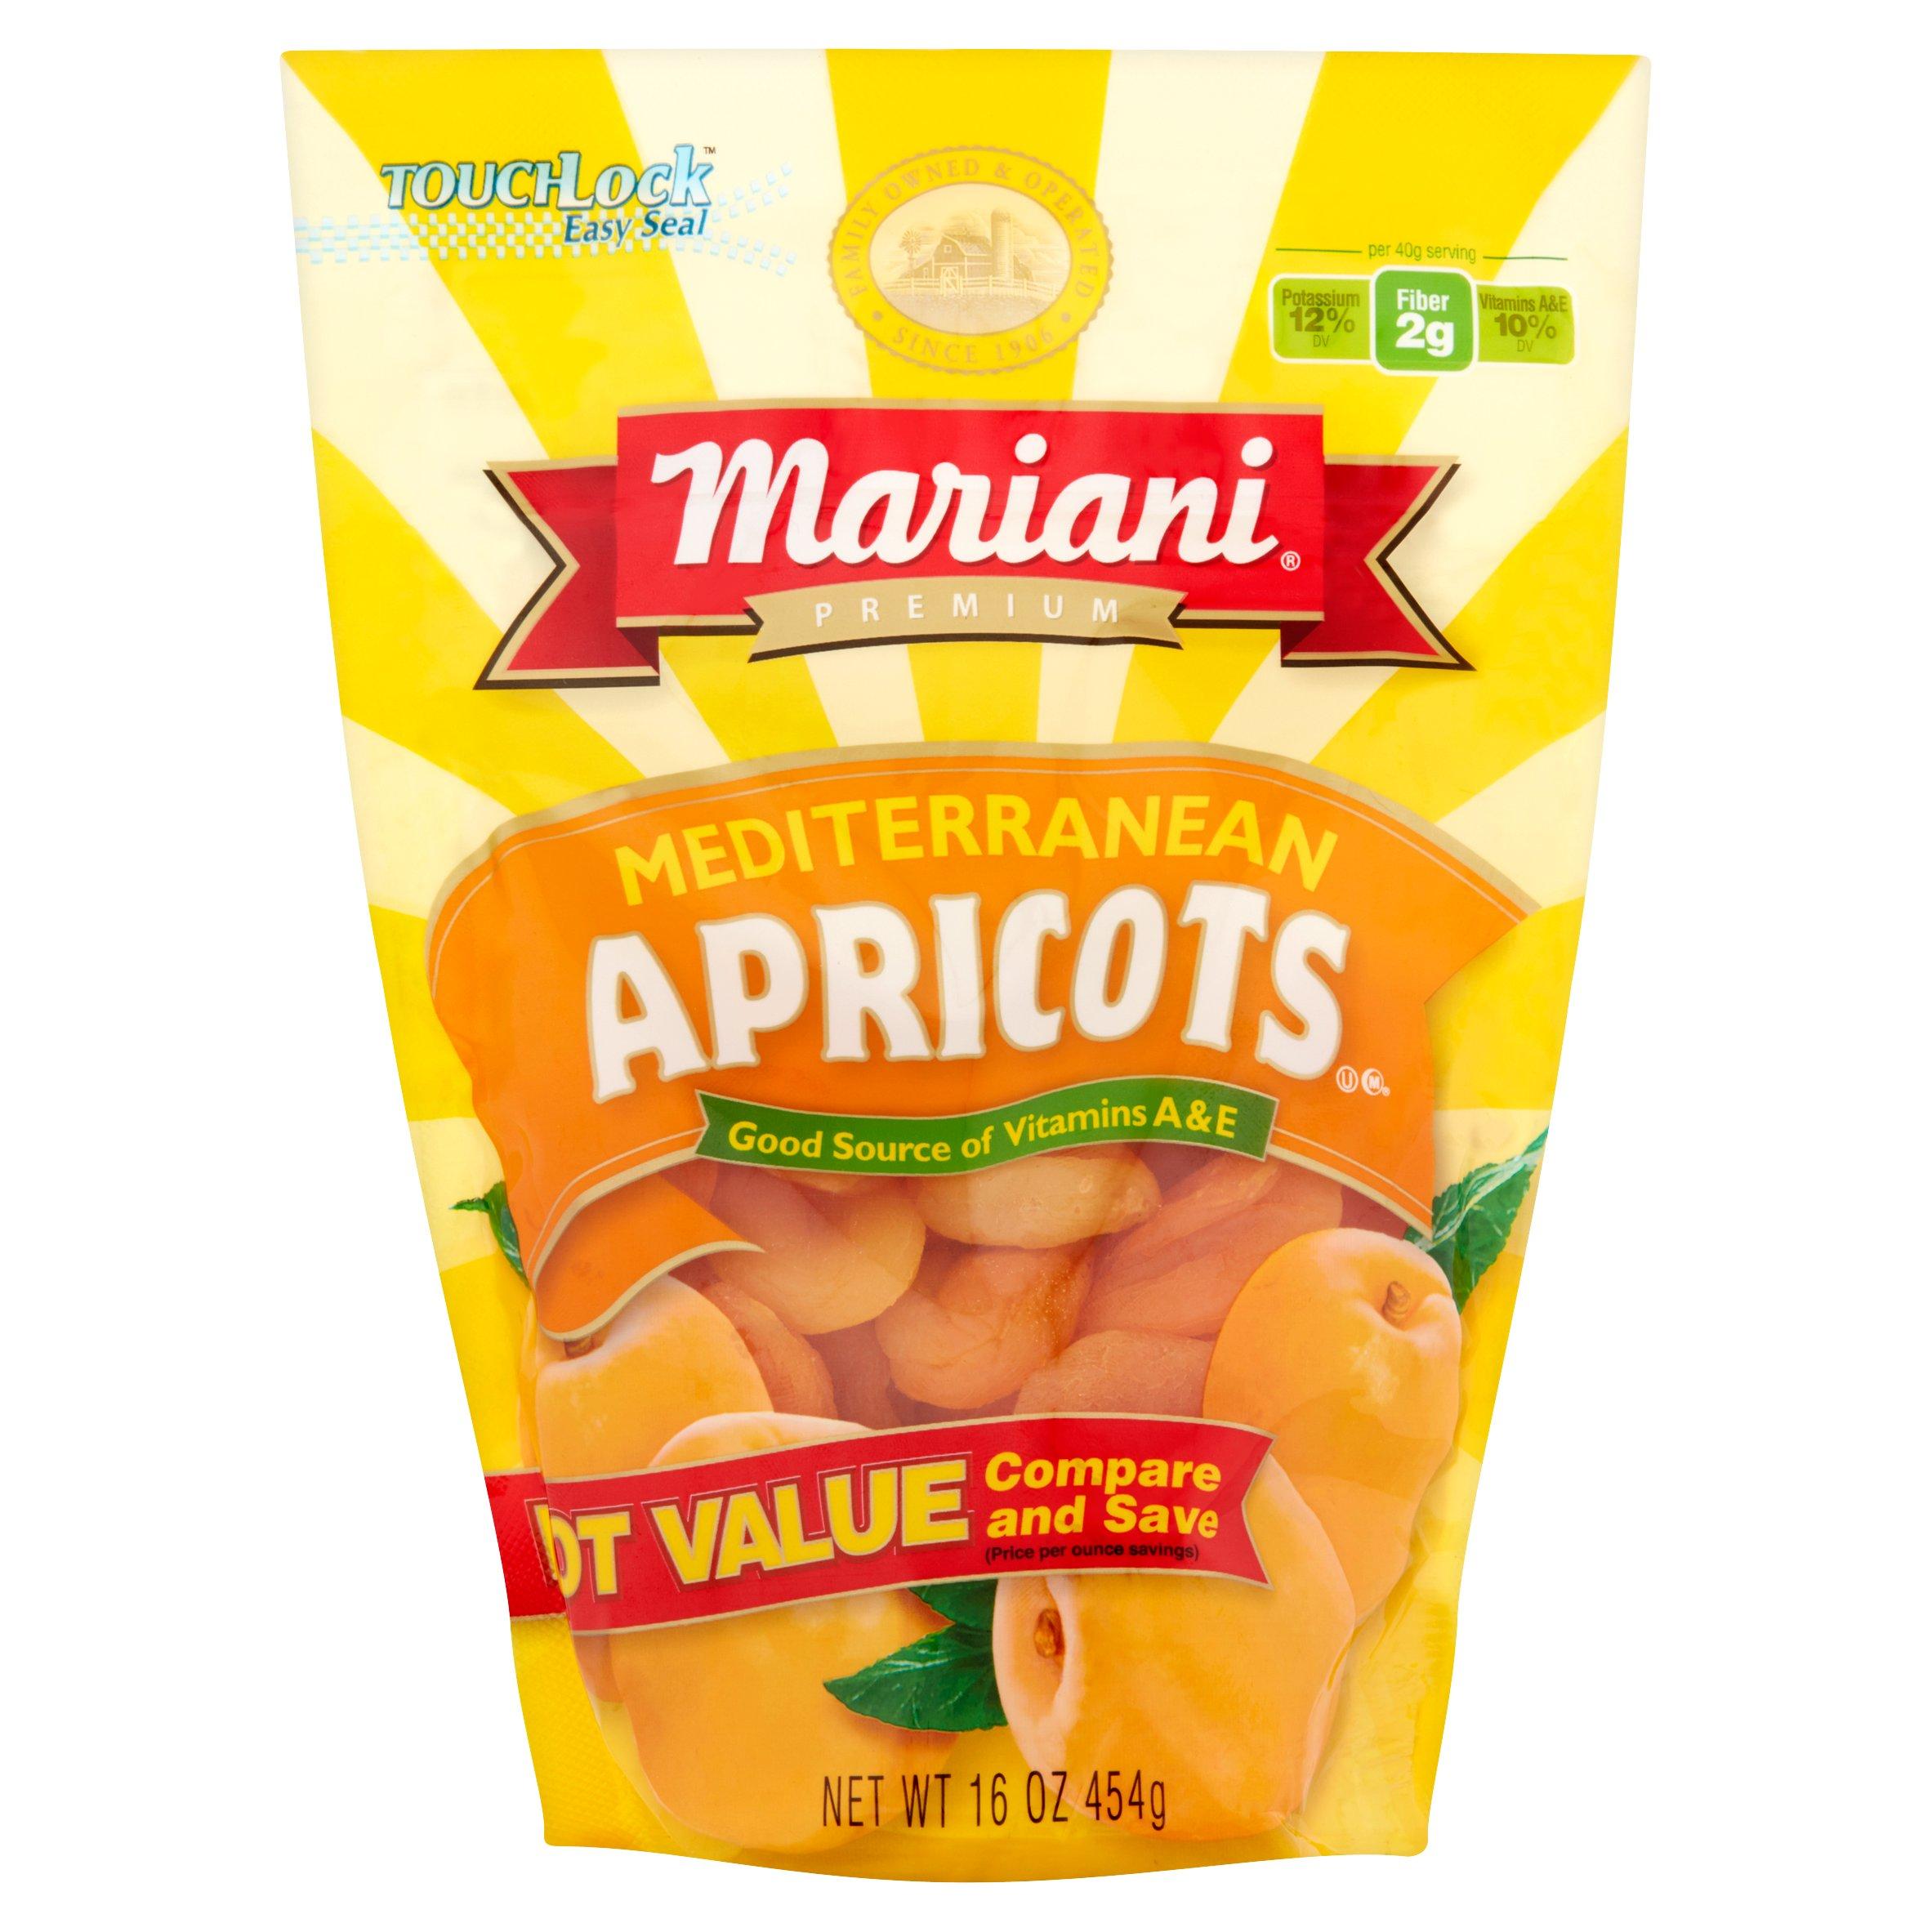 Mariani Mediterranean Apricots, 16 oz - Walmart.com